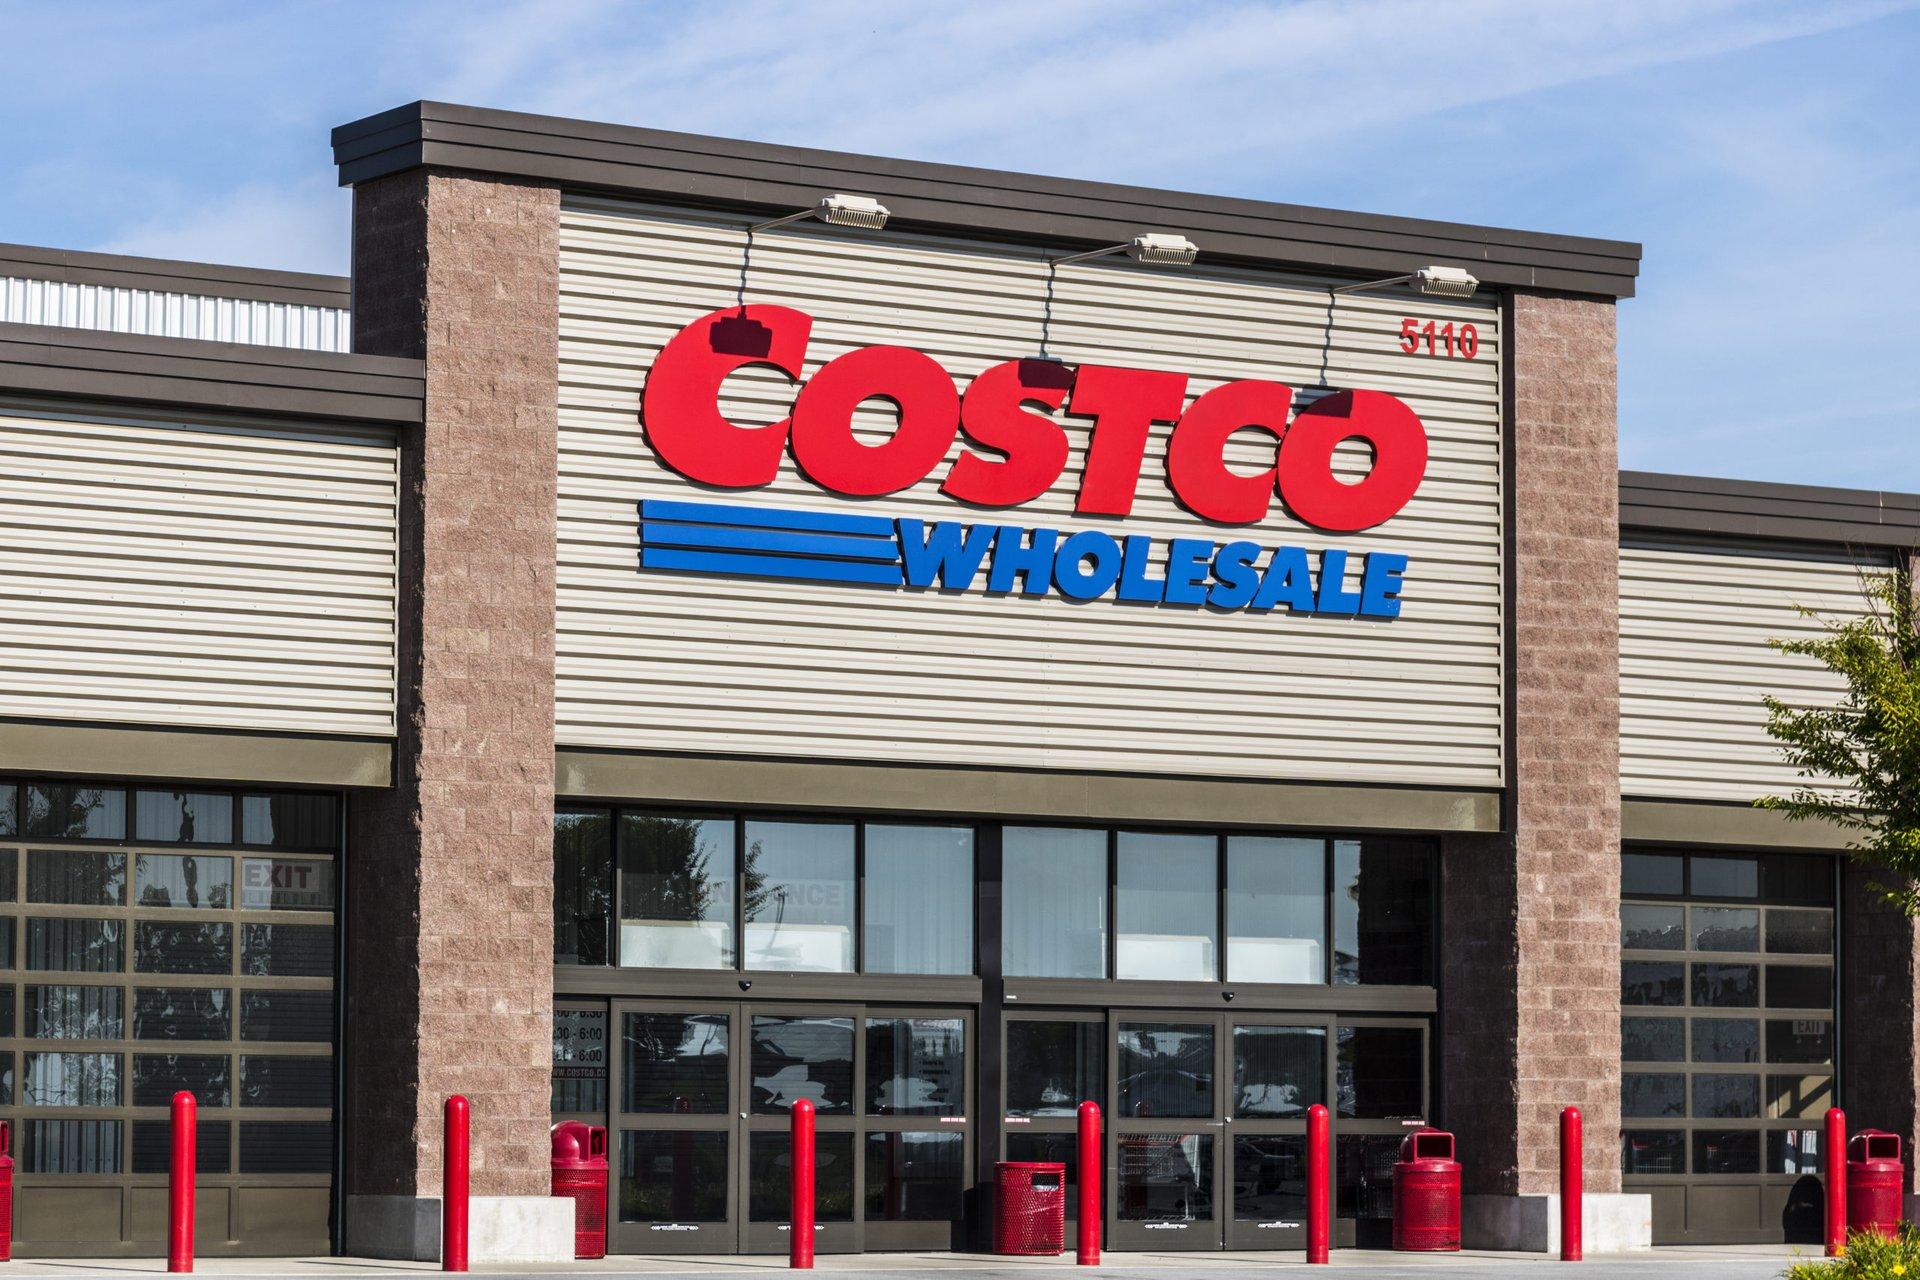 Costco Wholesale exterior